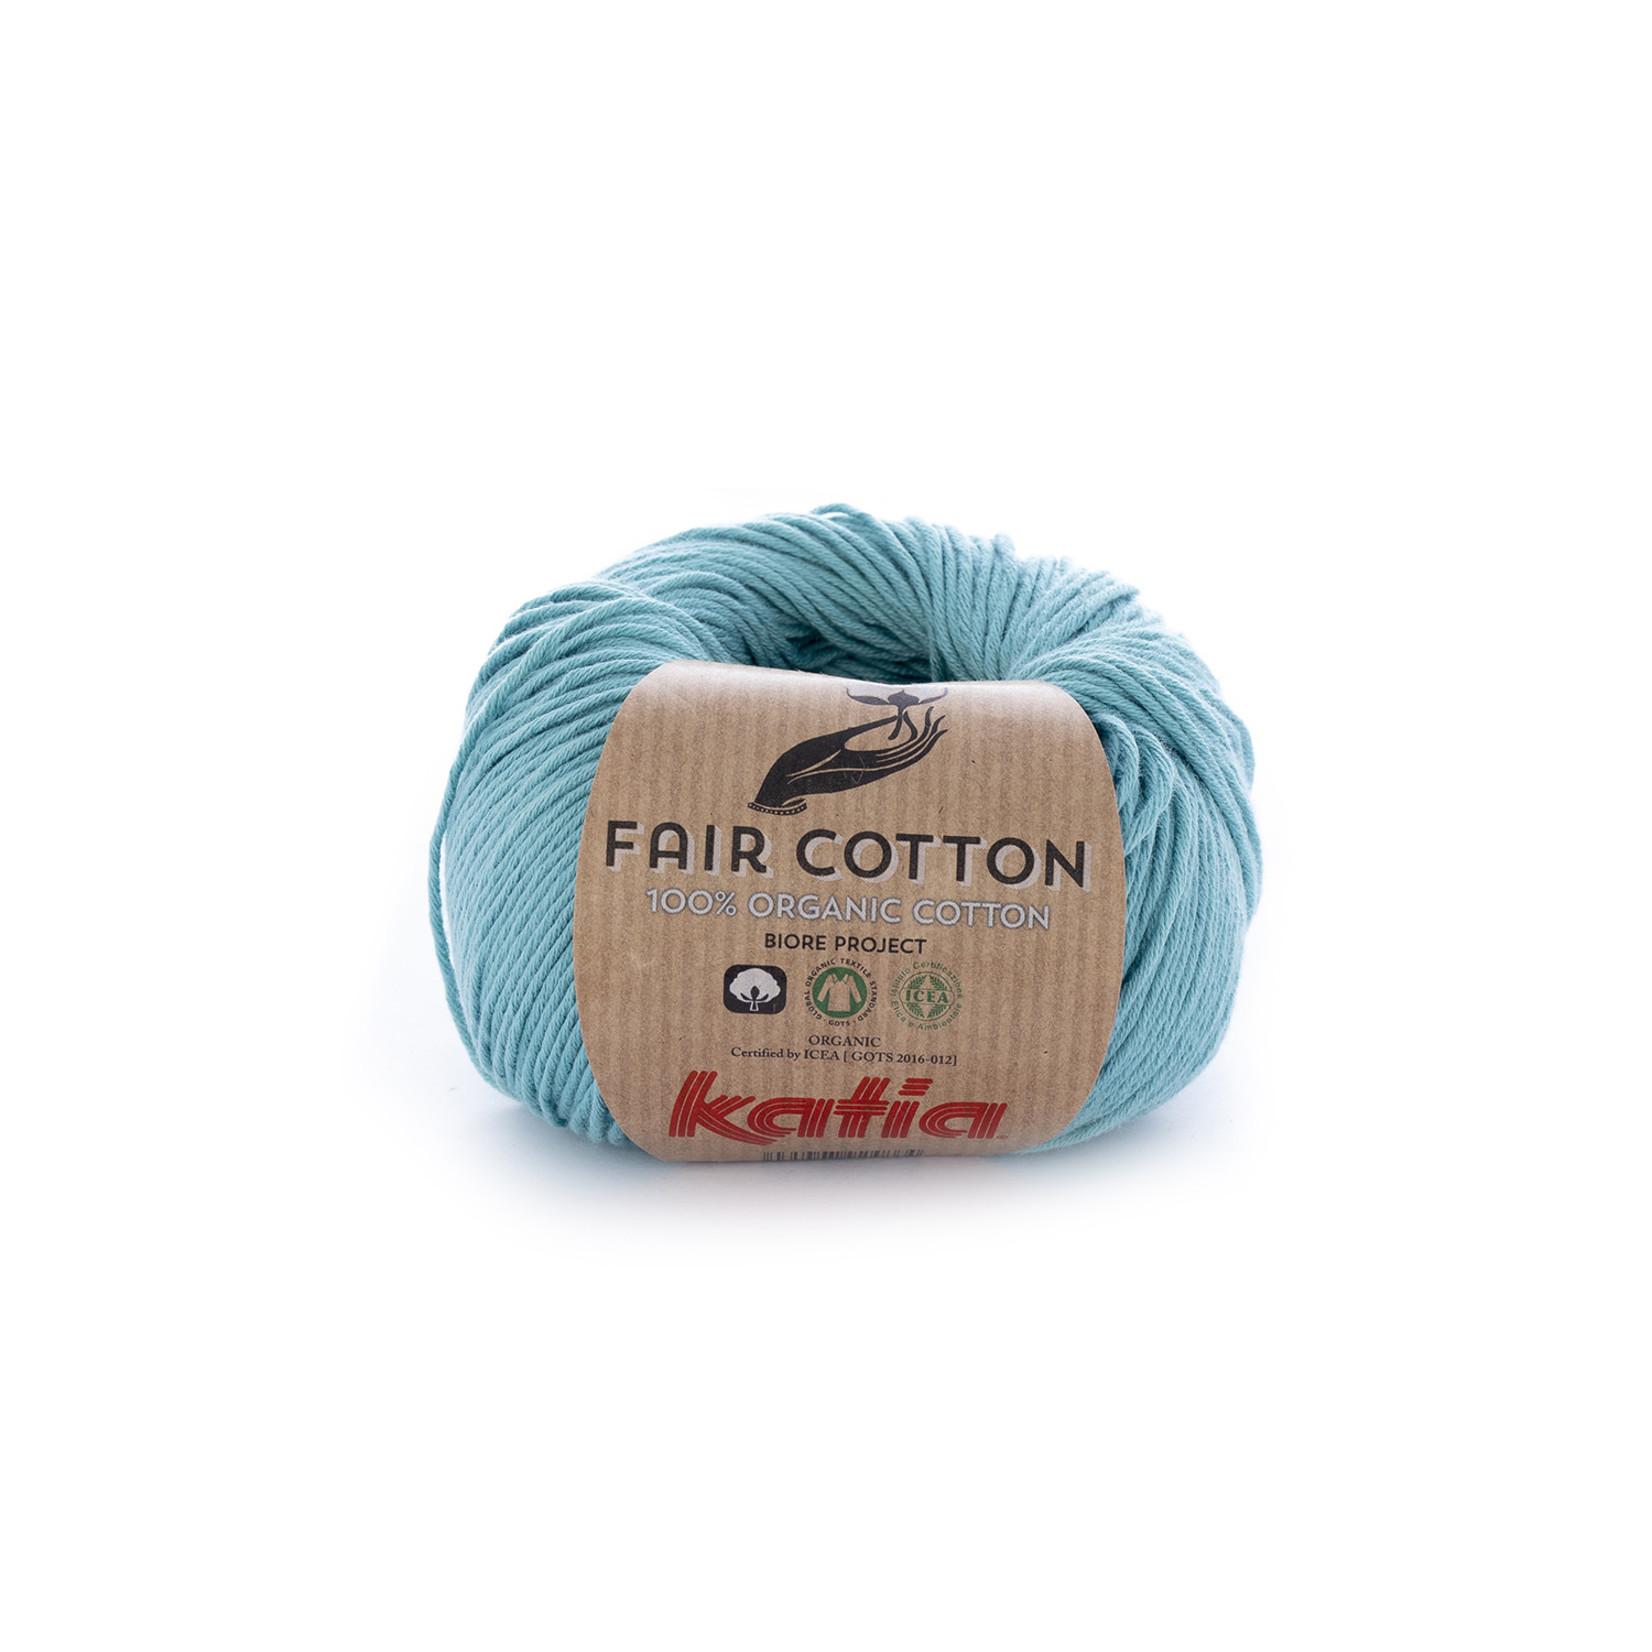 Katia Katia Fair Cotton 16 - turquoise - 1 bol = 50 gr. = 155 m. - 100% biol. katoen